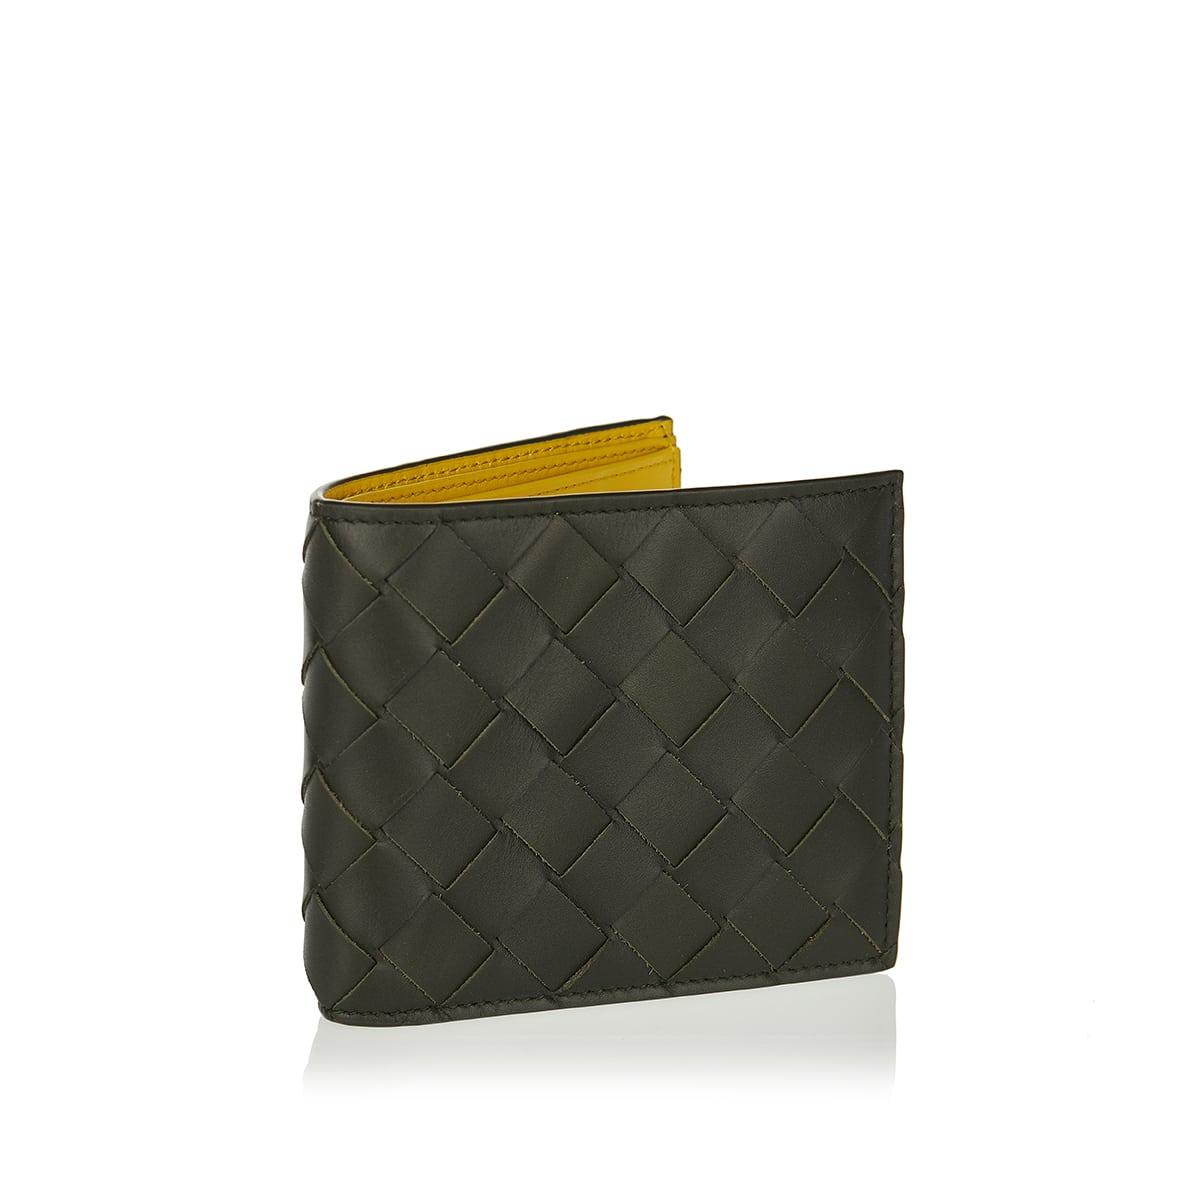 Two-tone Intrecciato bi-fold leather wallet